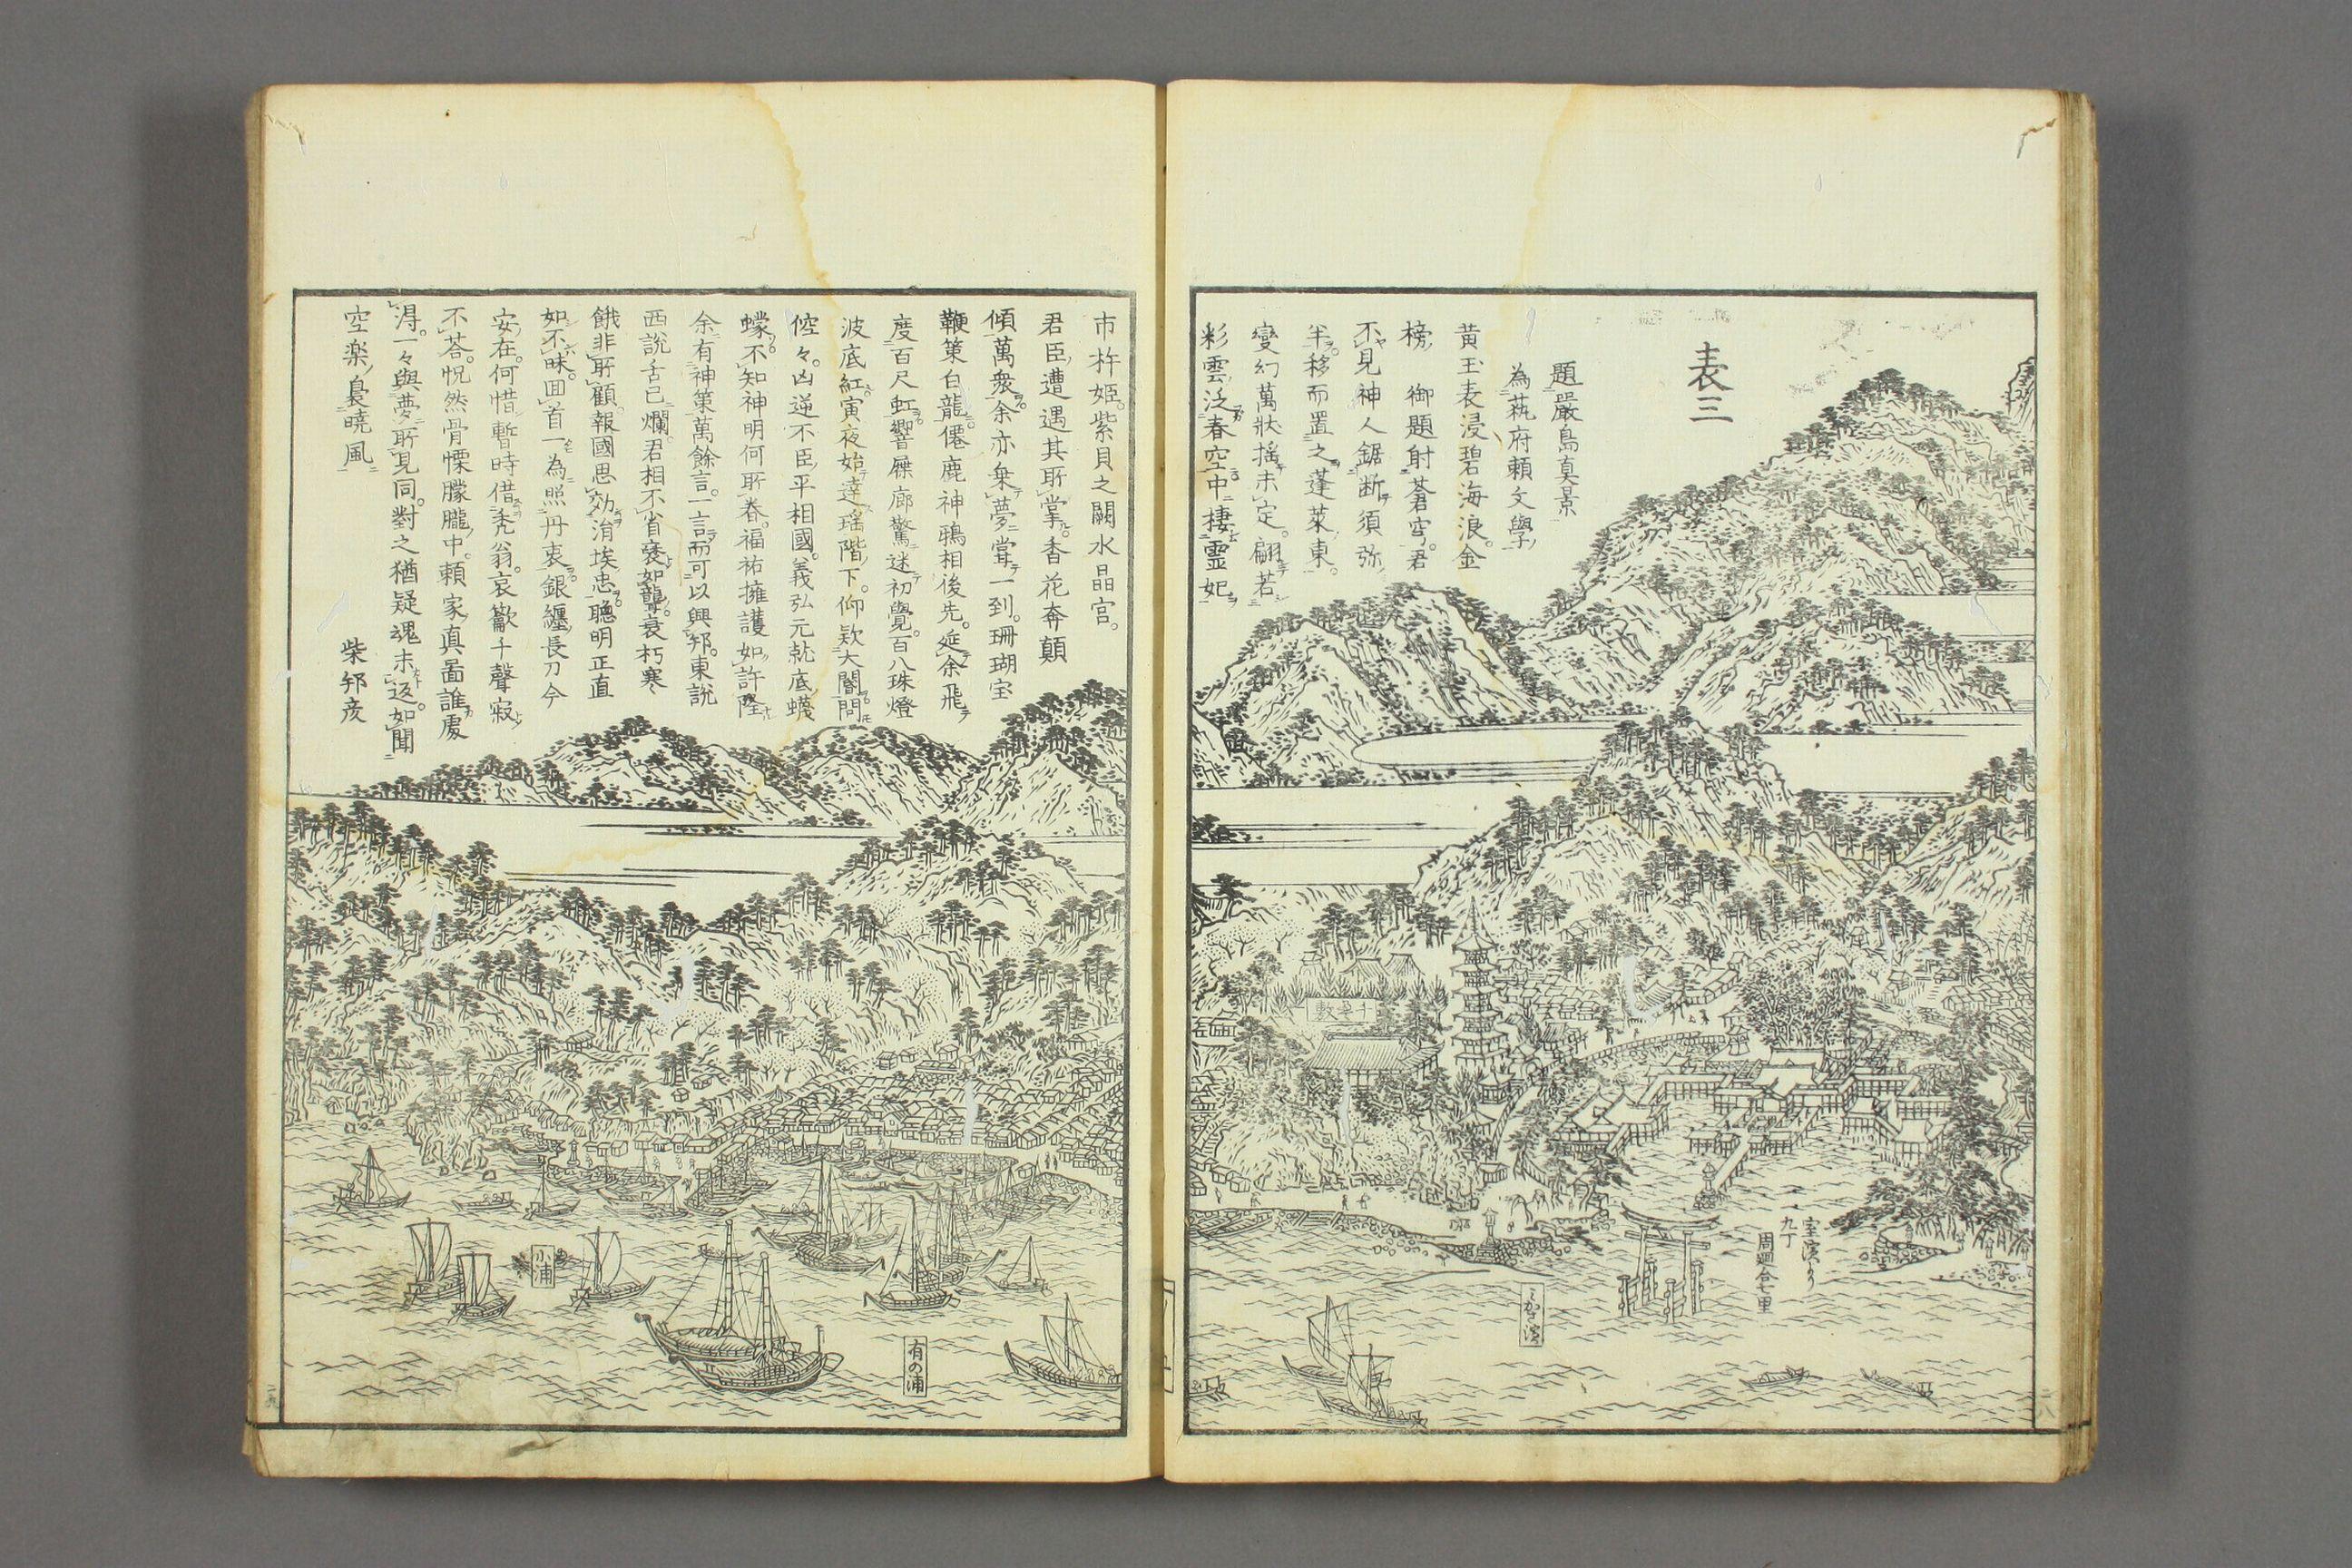 http://archive.wul.waseda.ac.jp/kosho/bunko30/bunko30_e0225/bunko30_e0225_0001/bunko30_e0225_0001_p0016.jpg